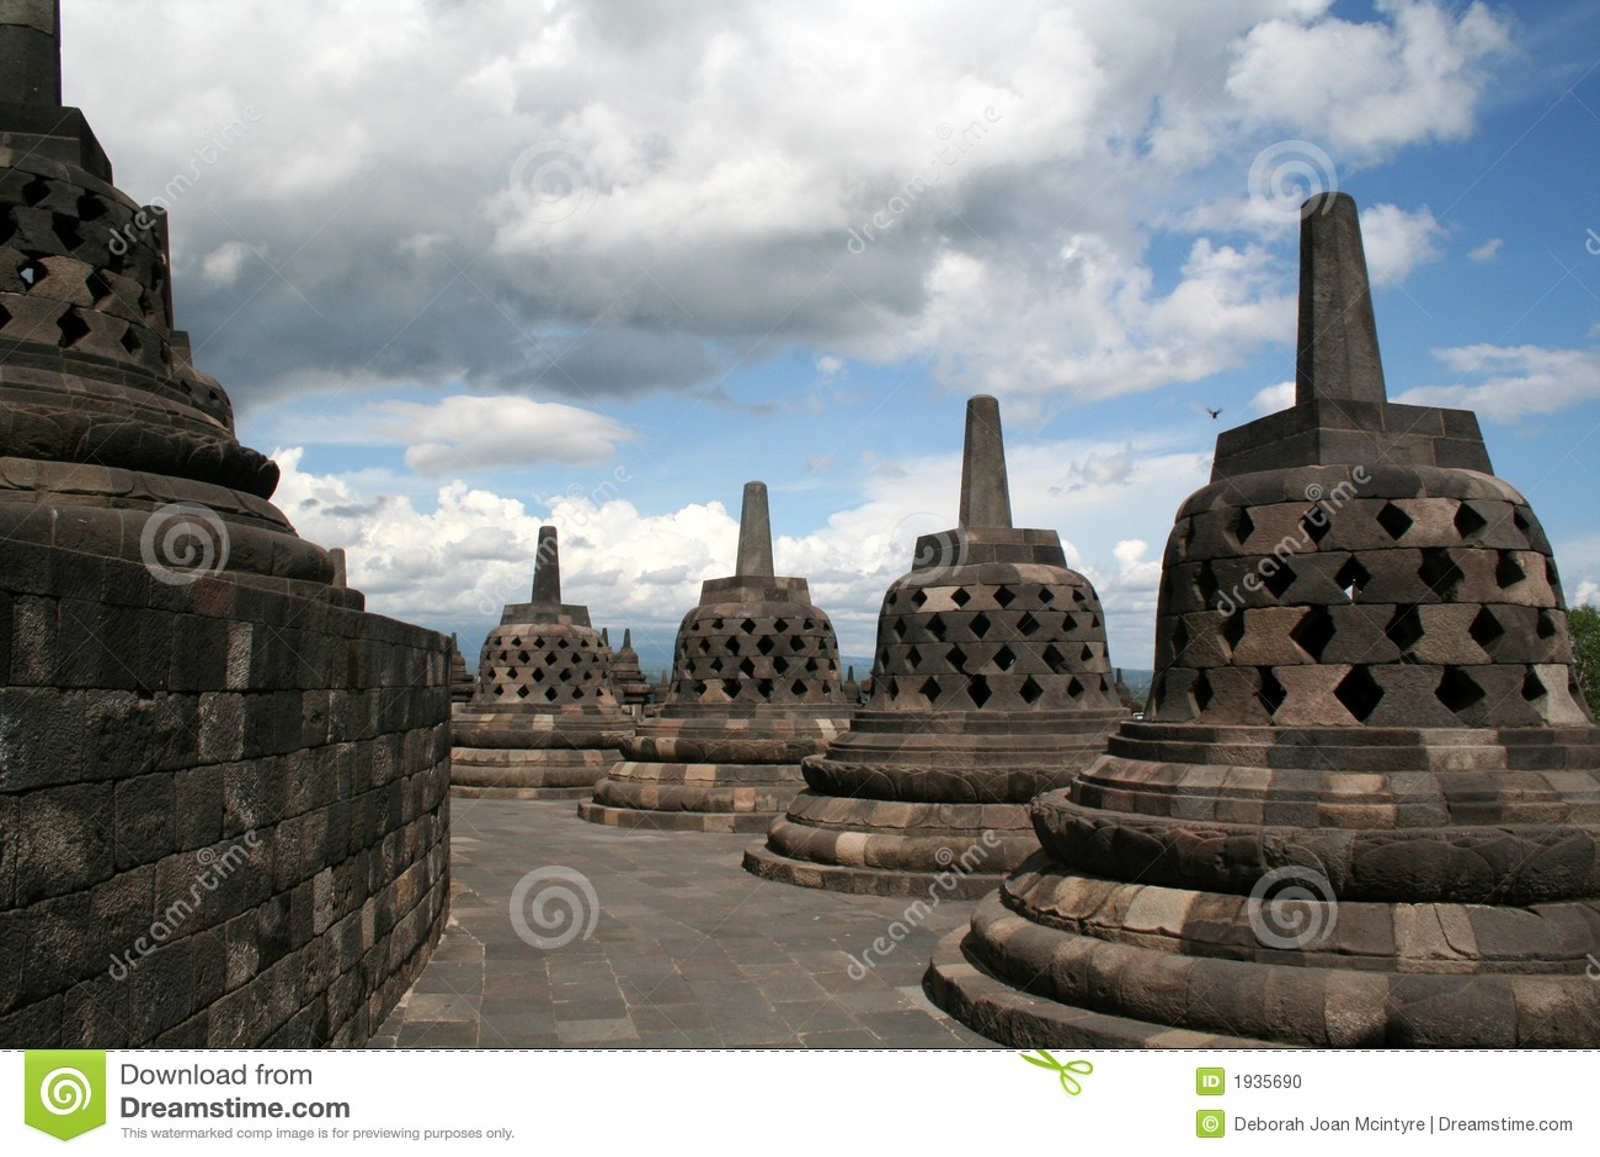 Borobudur Temple Facts For Kids